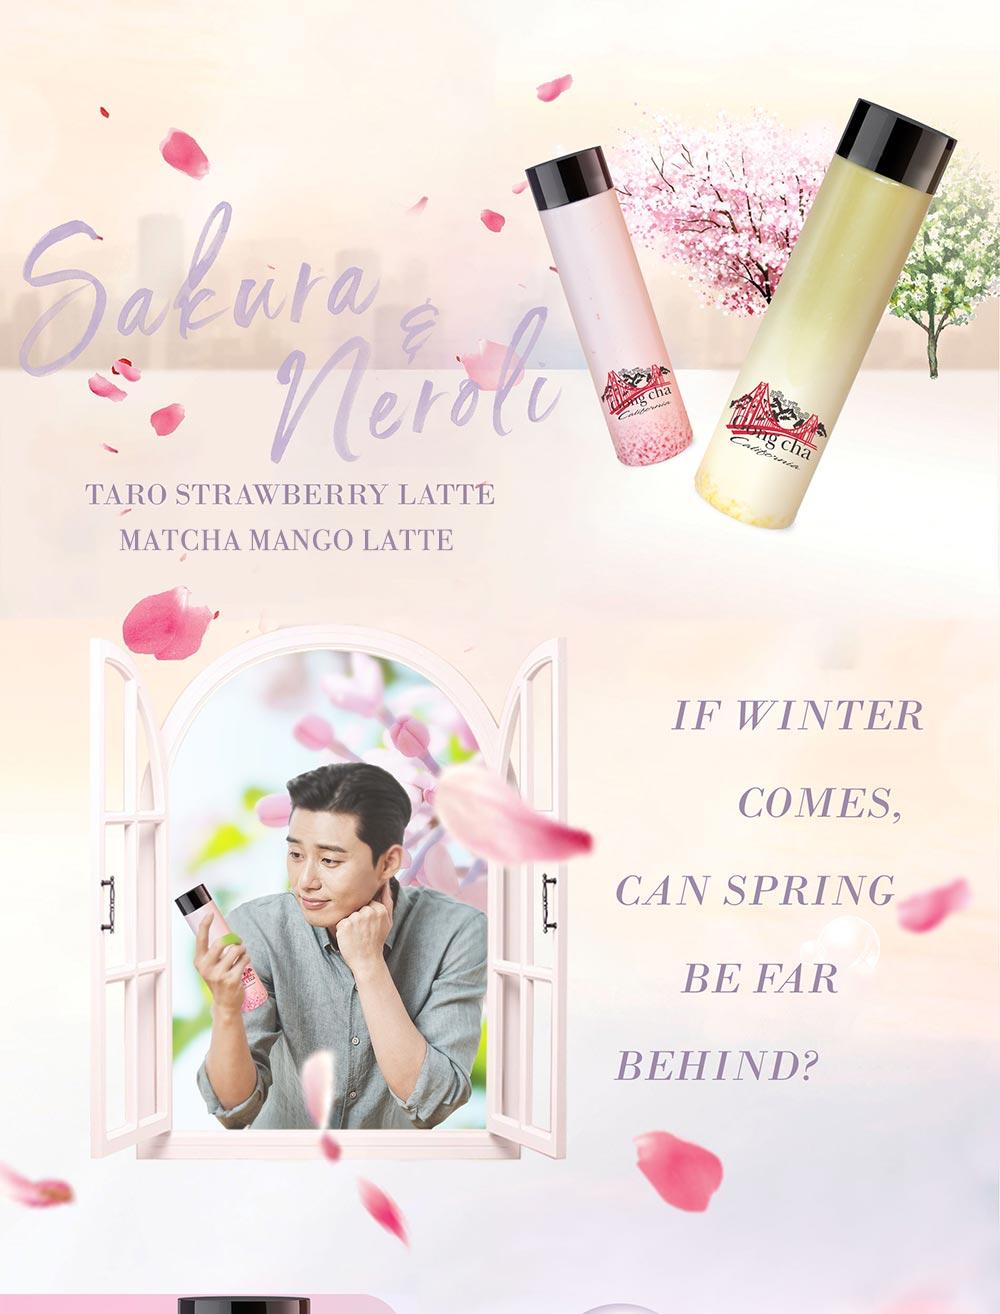 Sakura & Neroli - If winter comes, can spring be far behind?